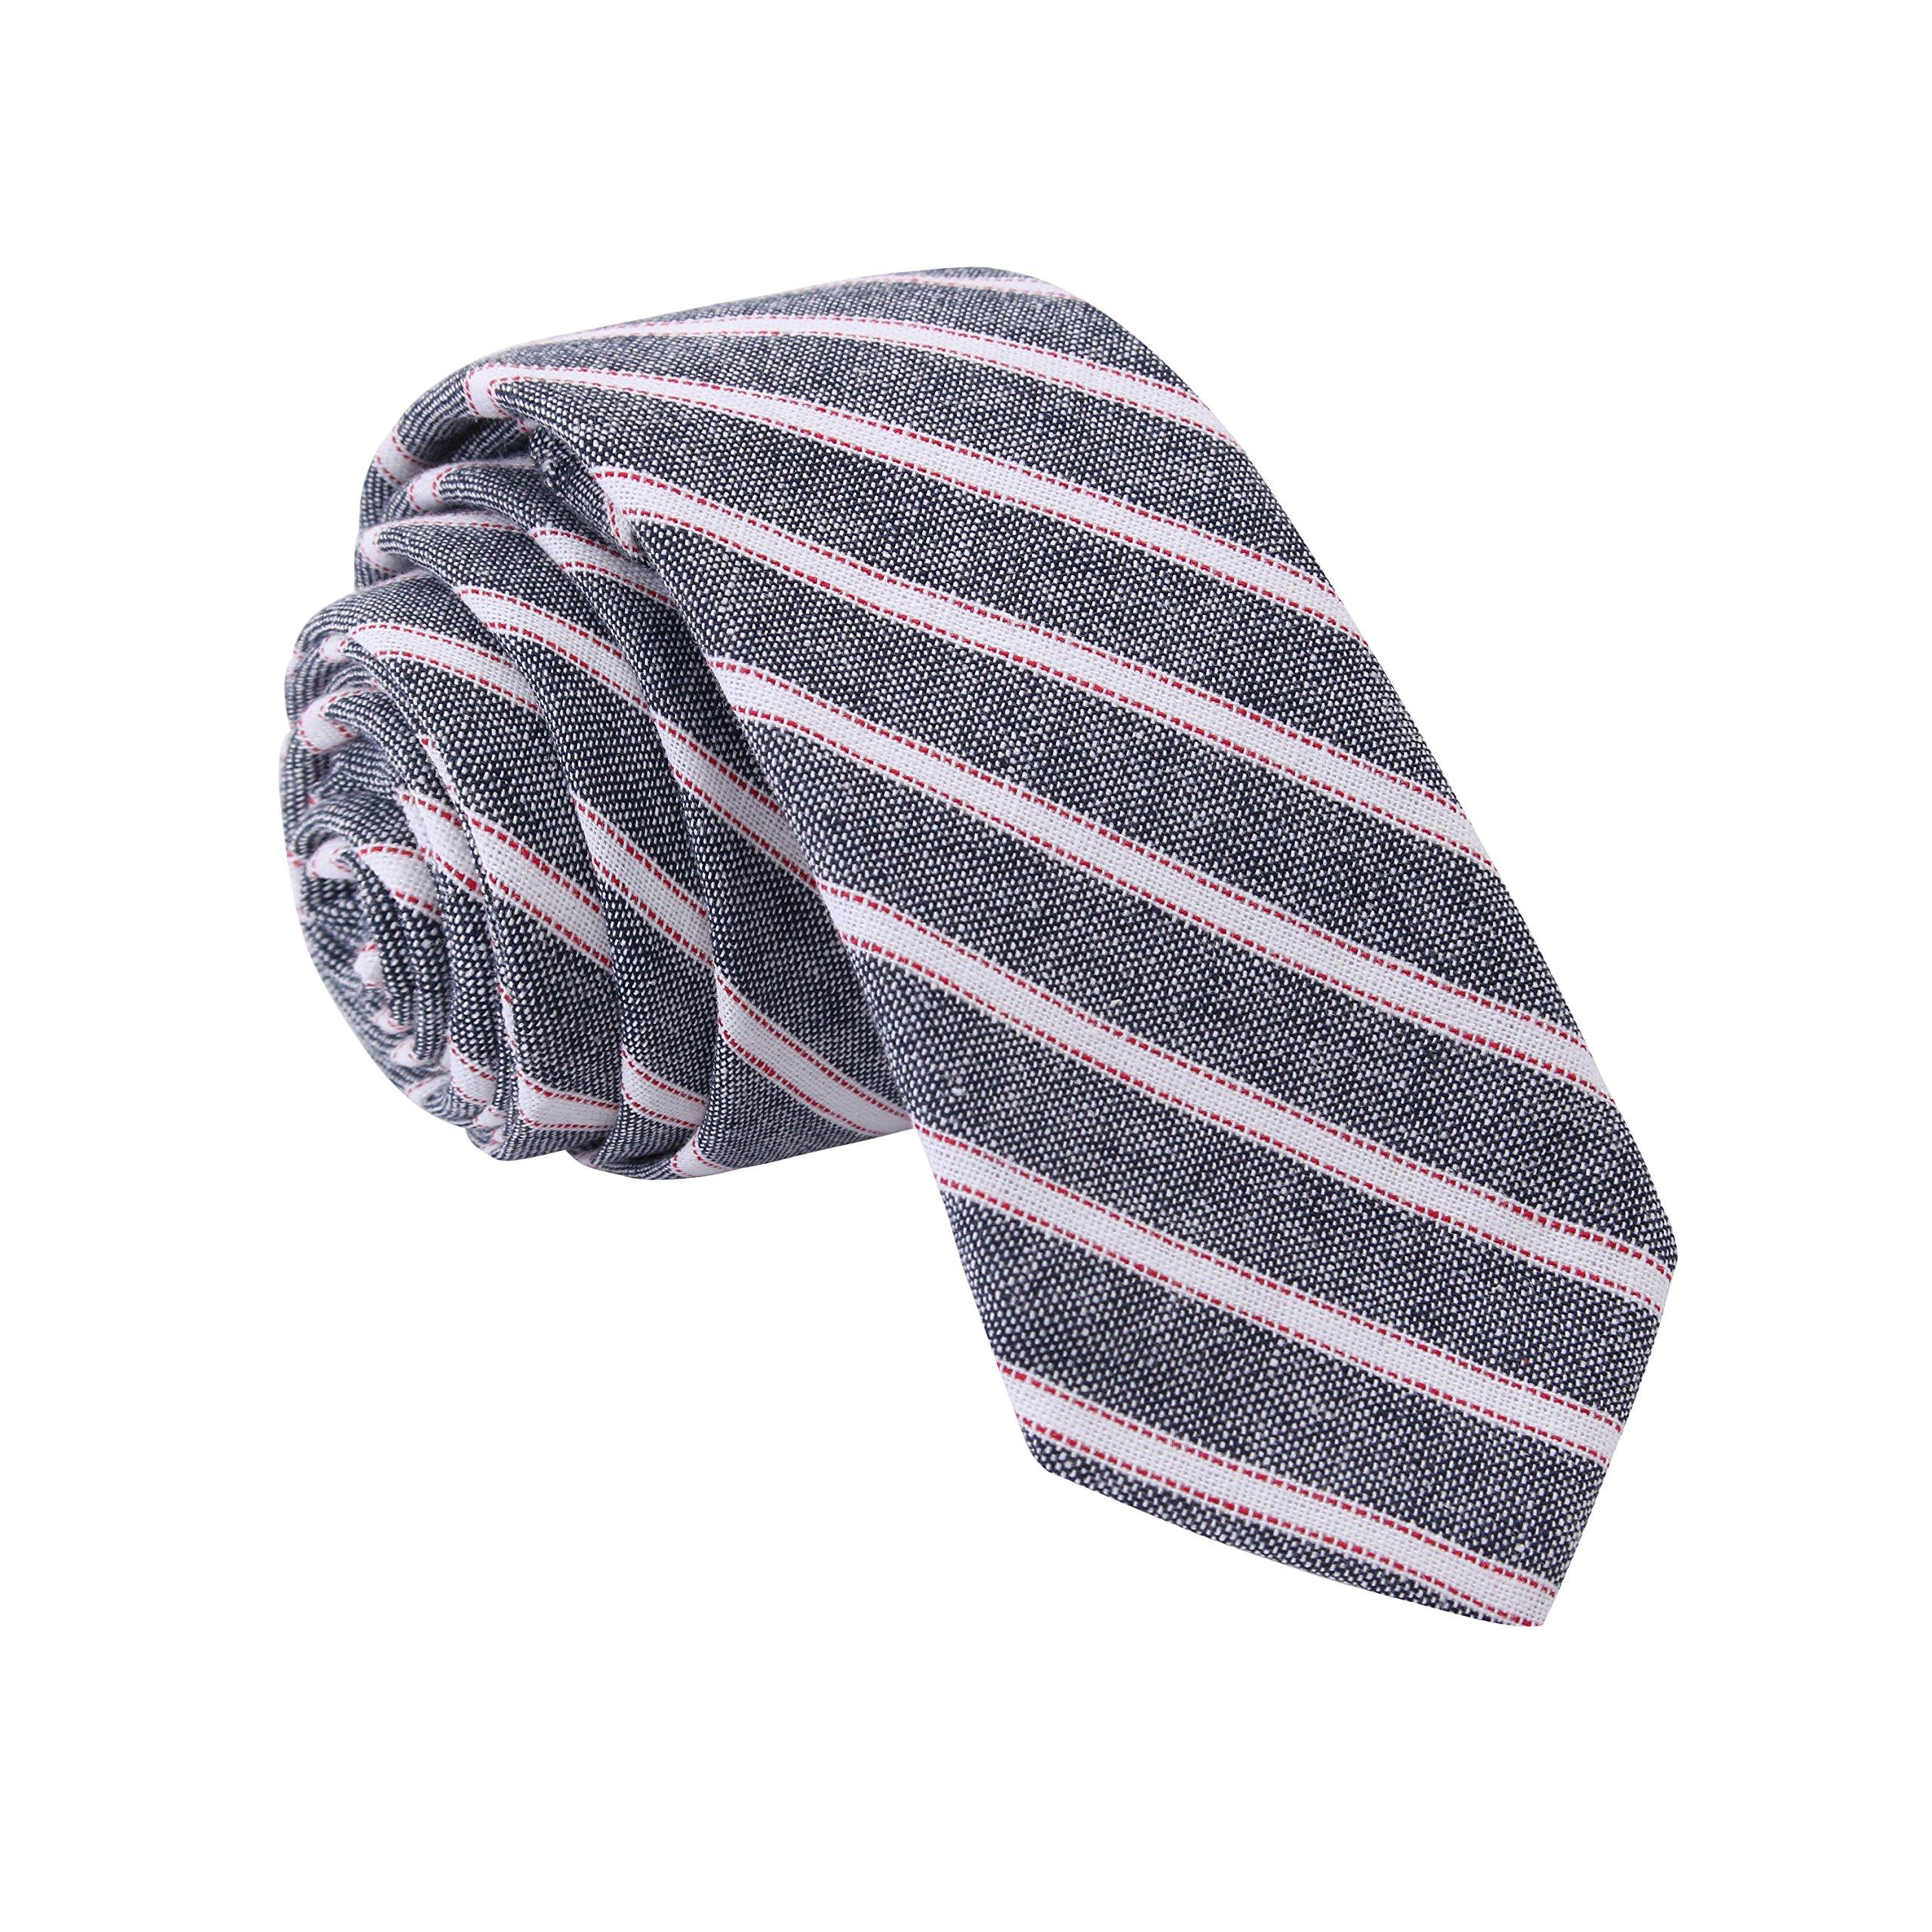 Tsheoul Noted Men's cotton Stripedl Neck Tie+ Gift Box